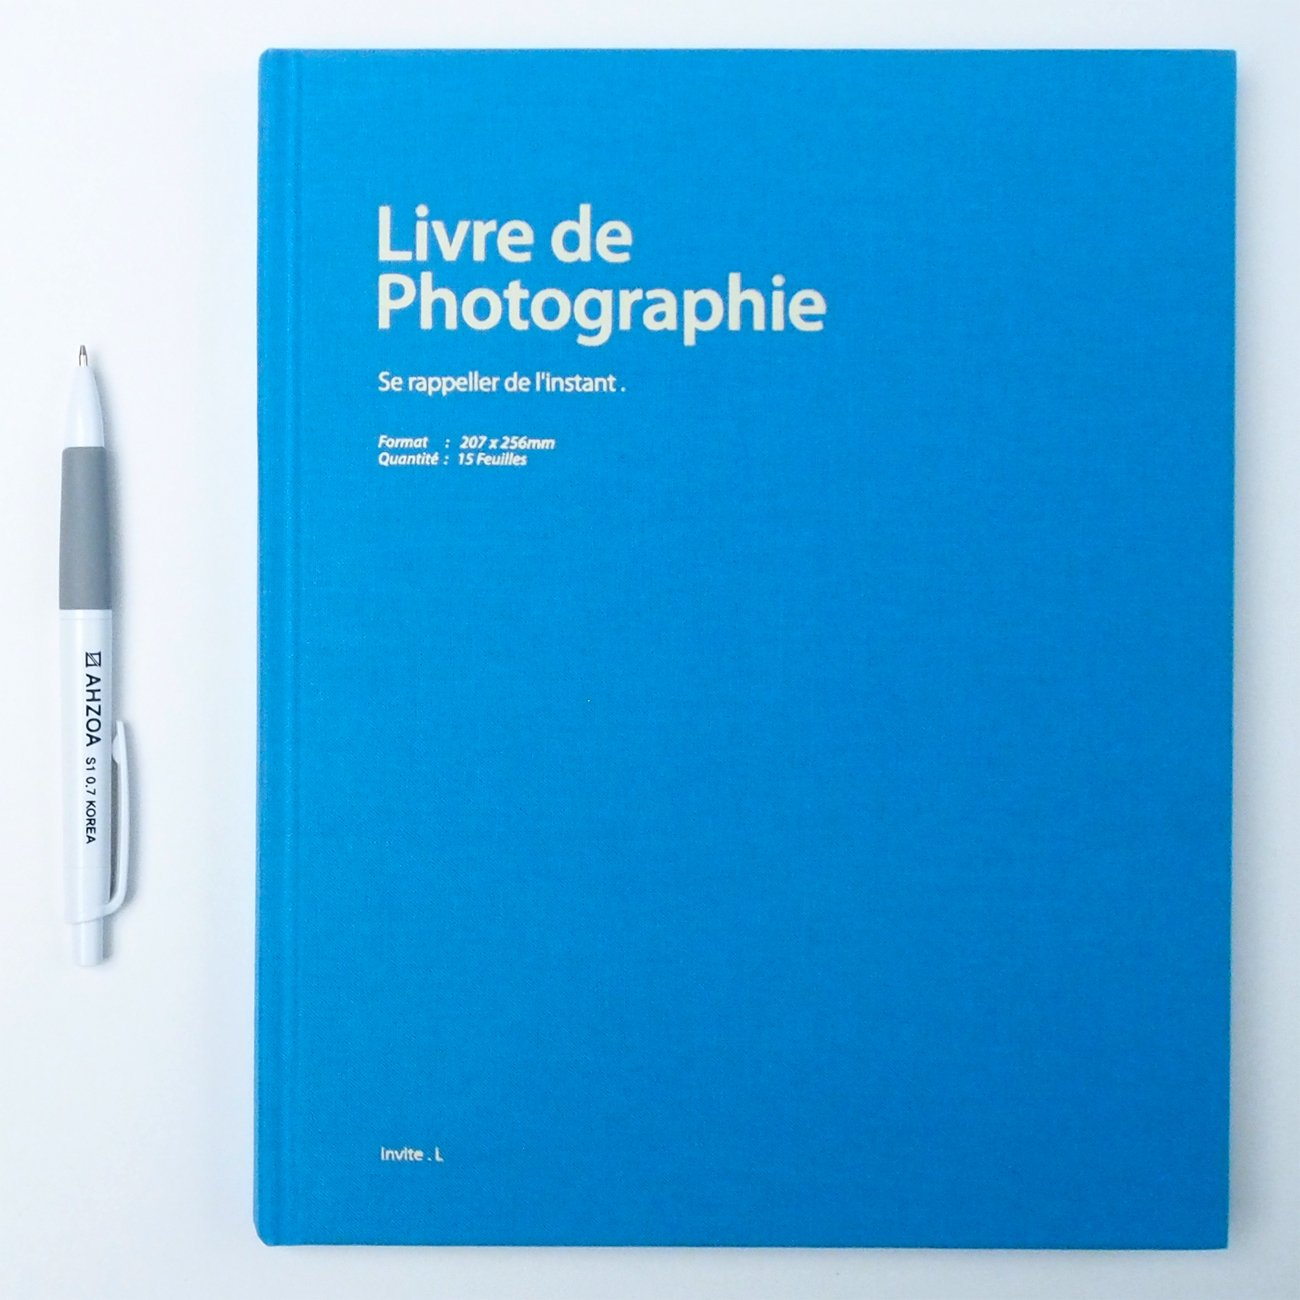 Sky Blue invite.l // AHZOA Bookcloth Photo Album with AHZOA Pencil 8.27 x 10.24 Inch 30 Pages